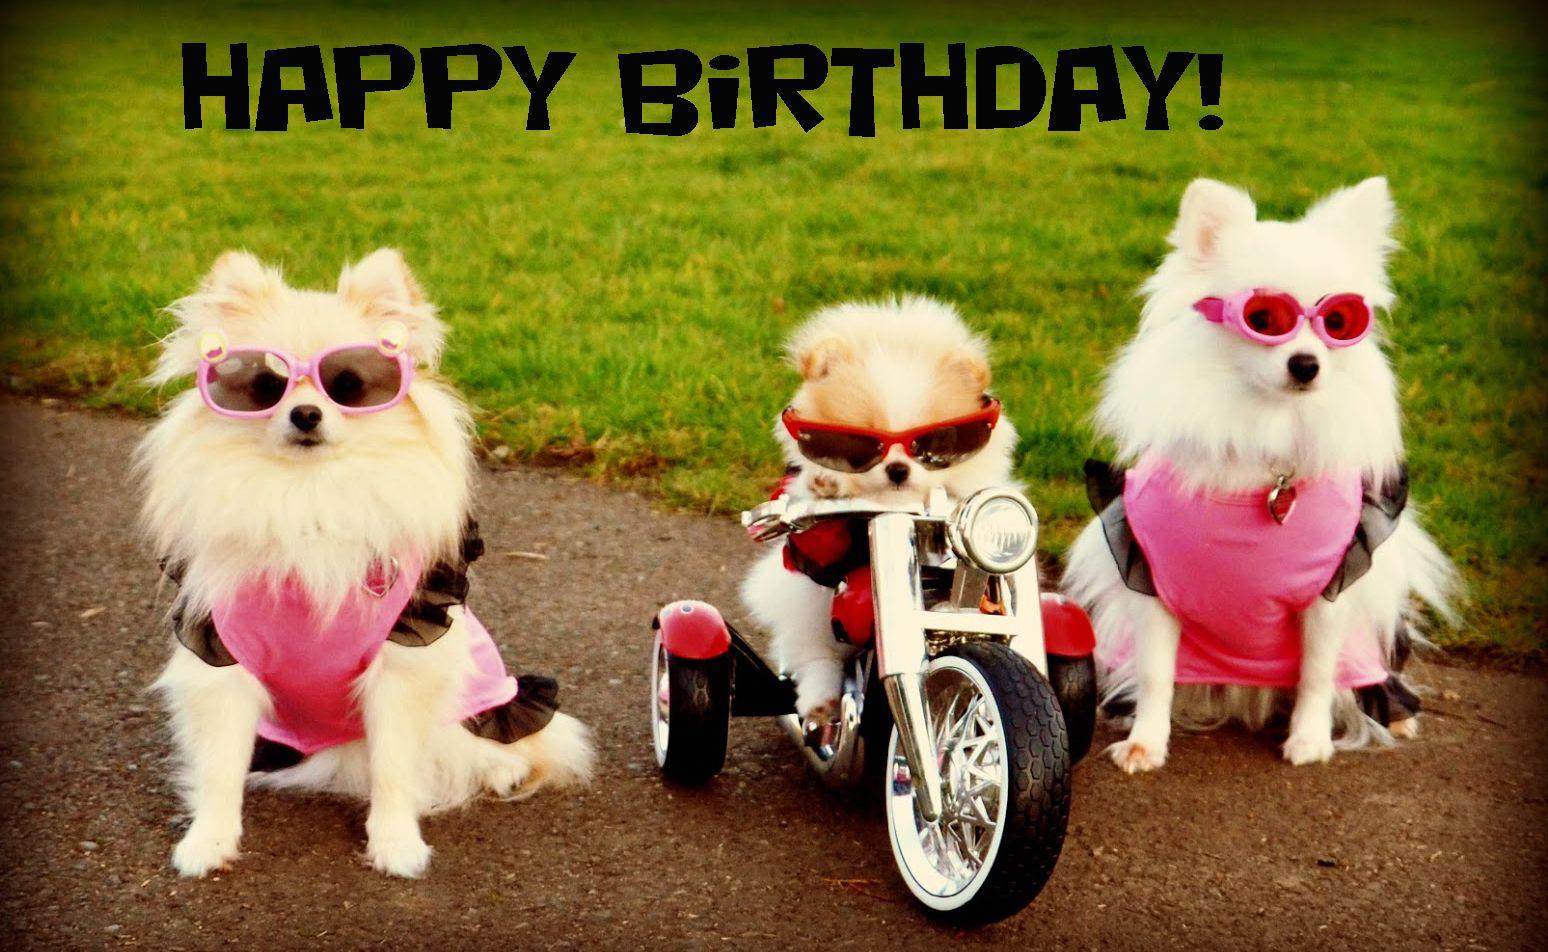 Happy Birthday Dog Dog Birthday Quotes And Images With Images Happy Birthday Dog Happy Birthday Dog Meme Happy Birthday Chihuahua